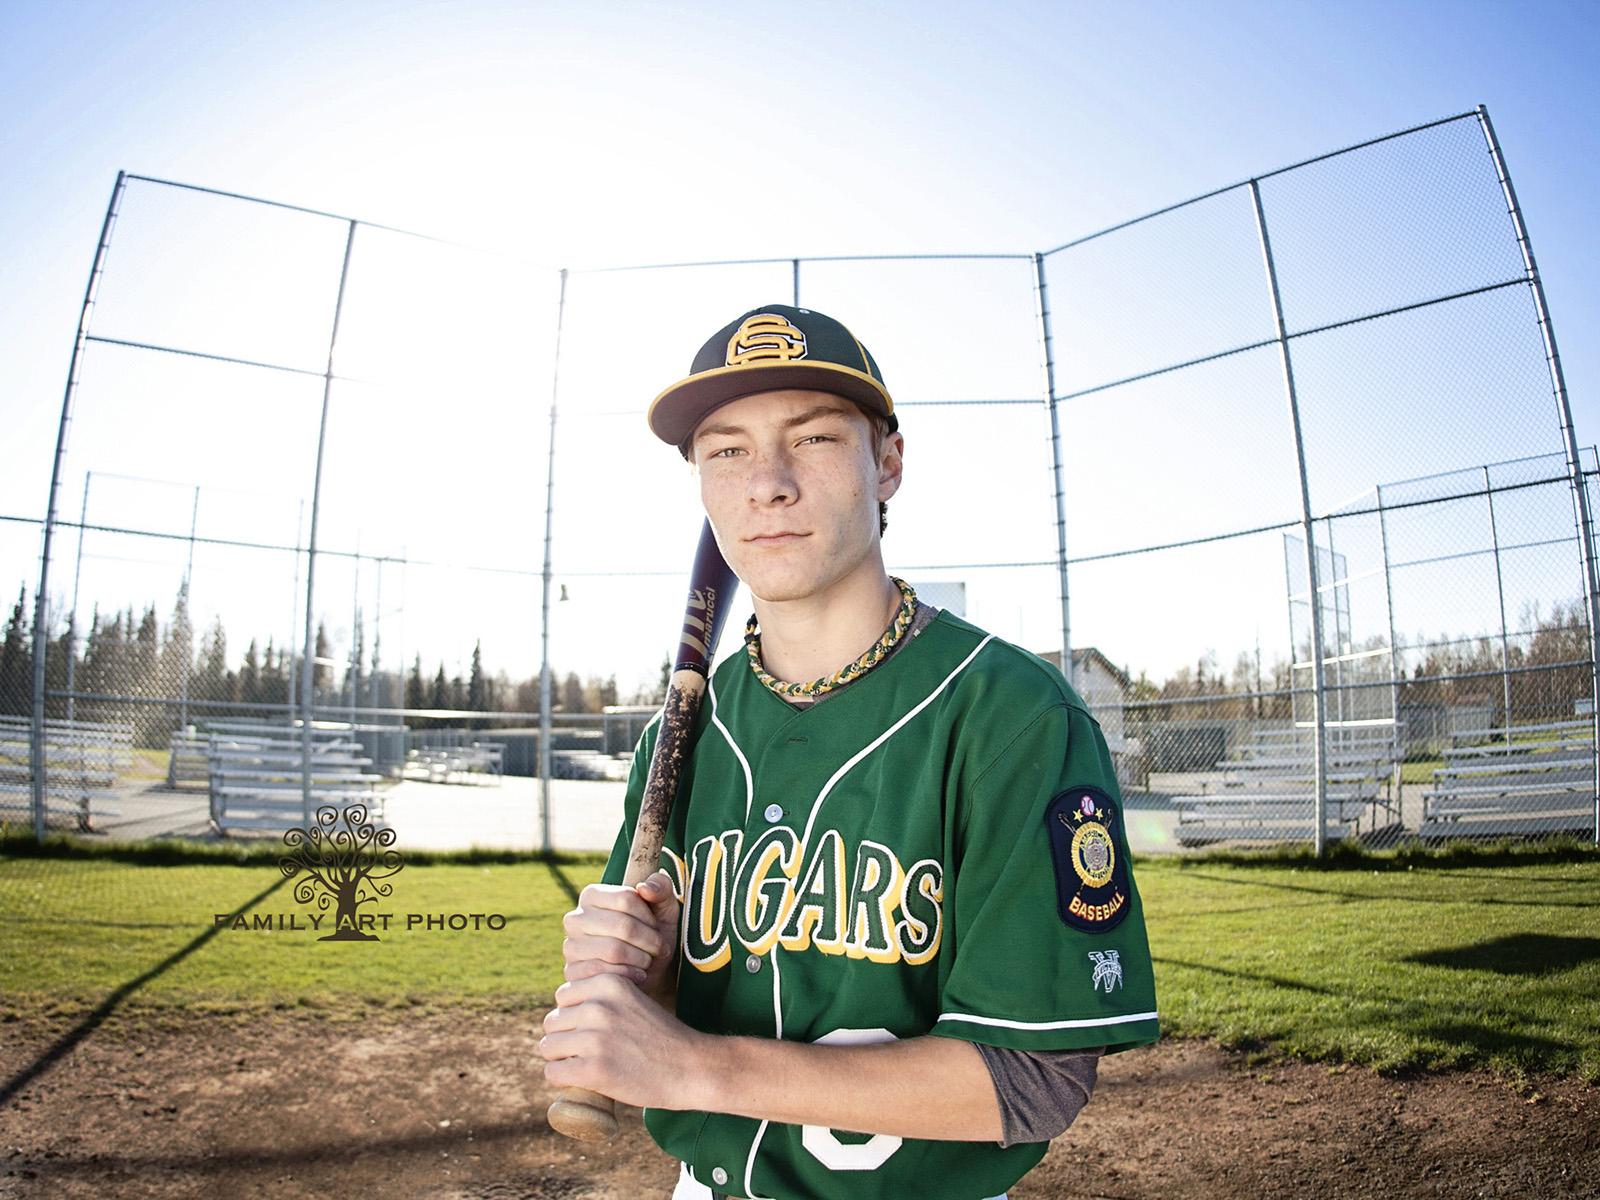 Anchorage High School Senior Sport Photography